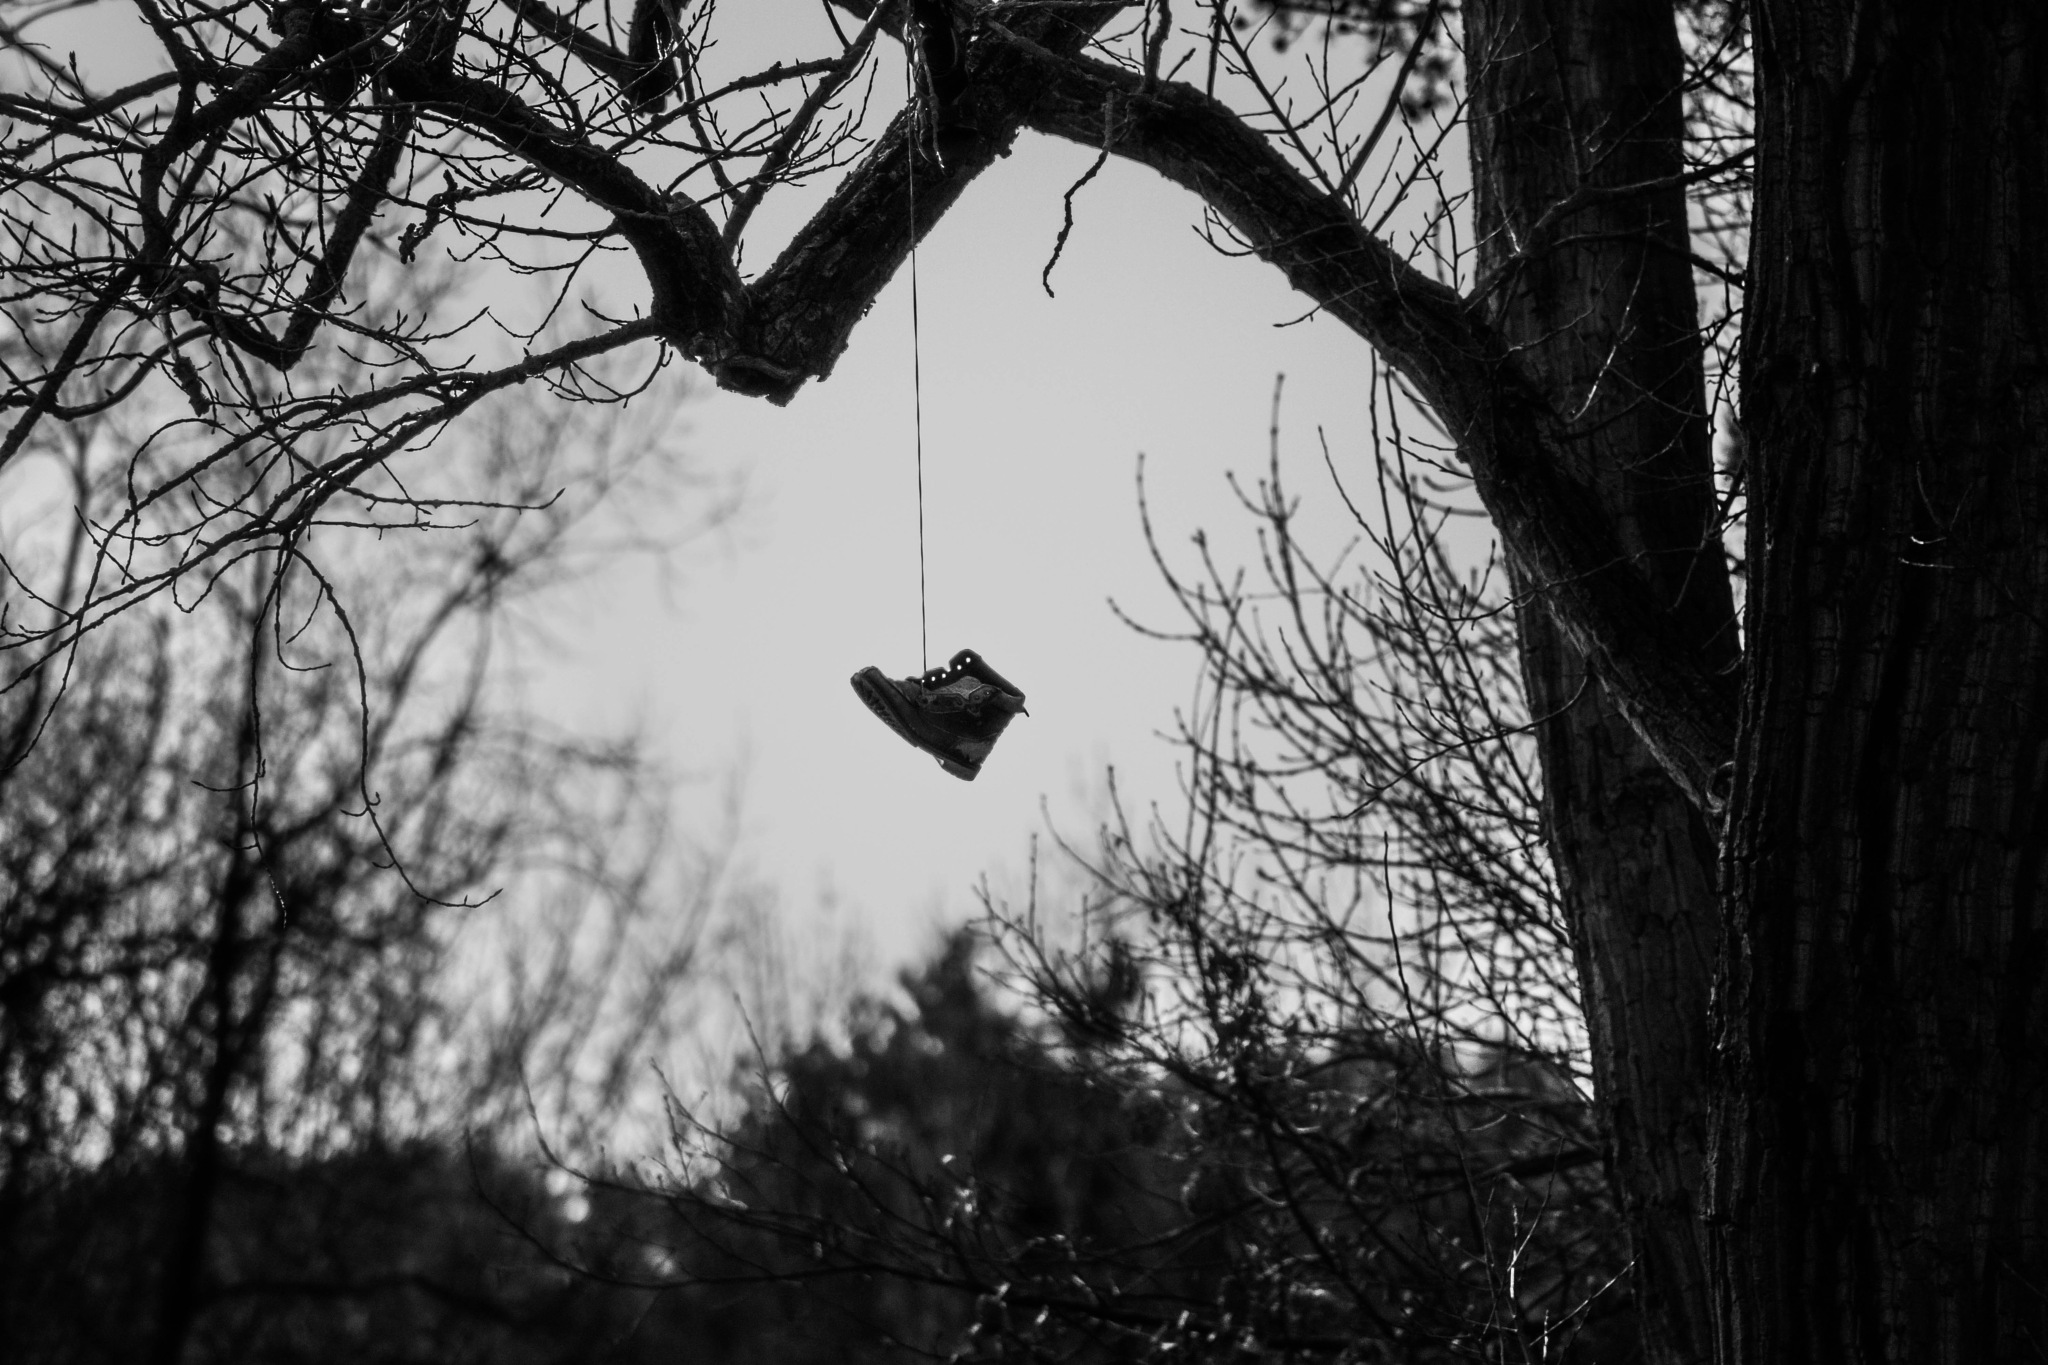 Schuh im Baum by Nico Karl Döhne